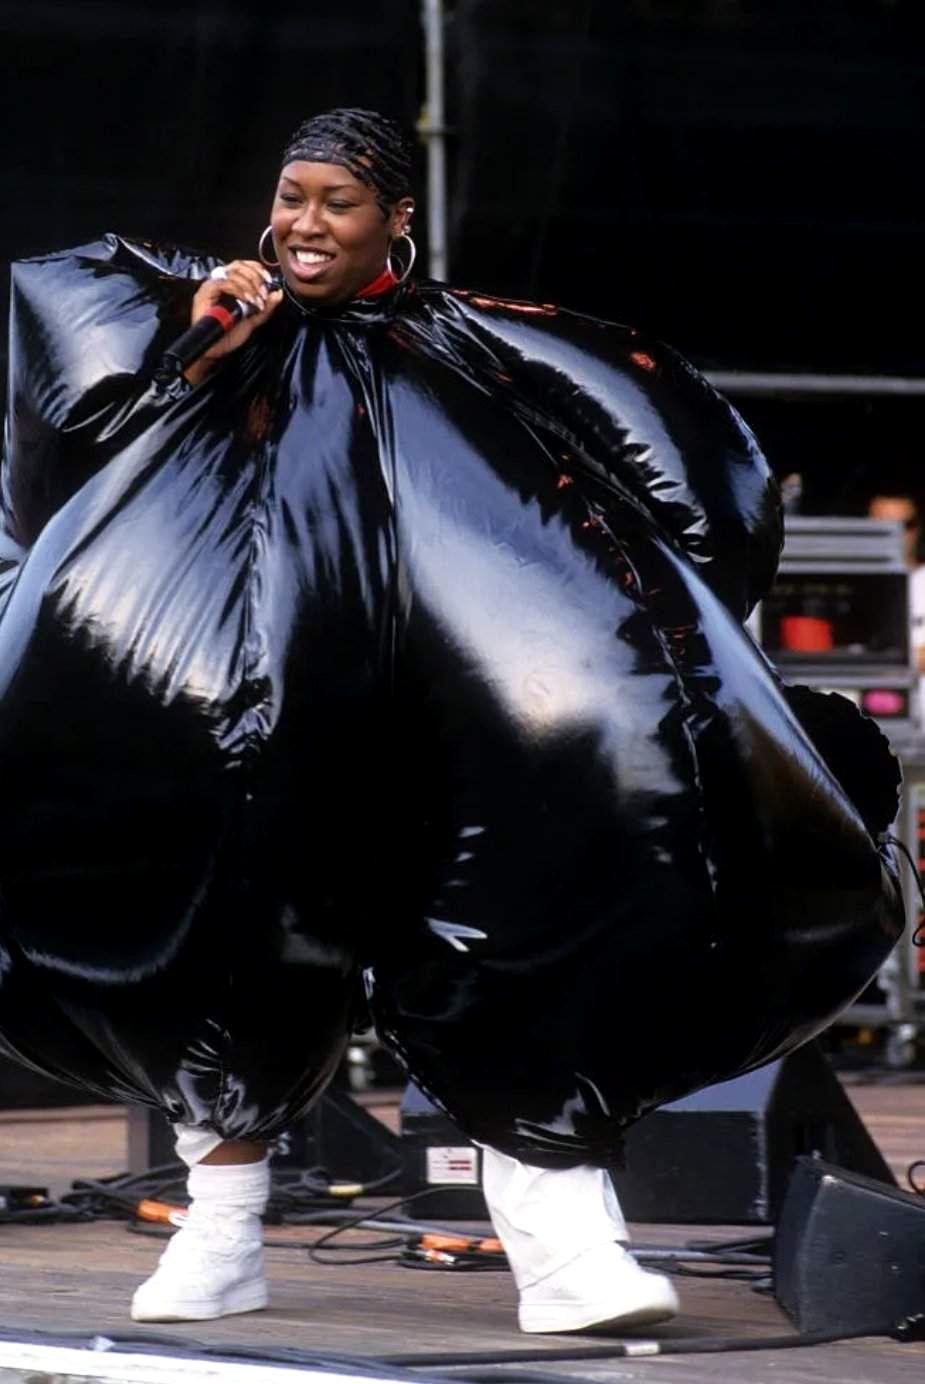 Missy Elliott — иконы 90-х, вдохновившие Билли Айлиш